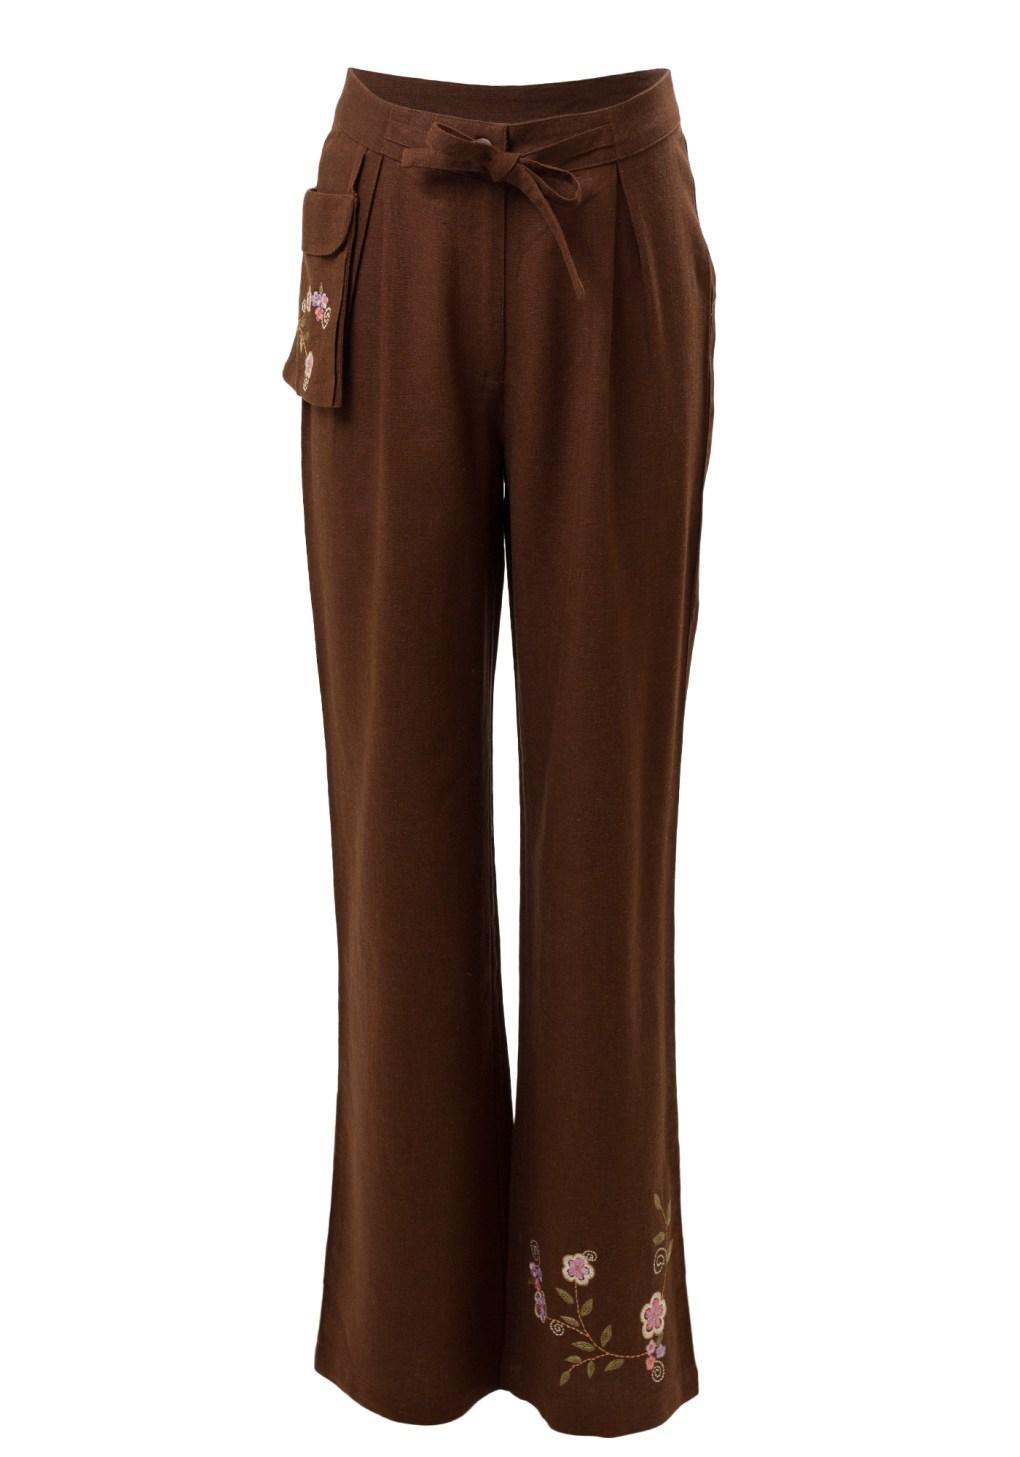 MINC ecofashion Sweet Pea Girls Trousers in Brown Cotton Linen